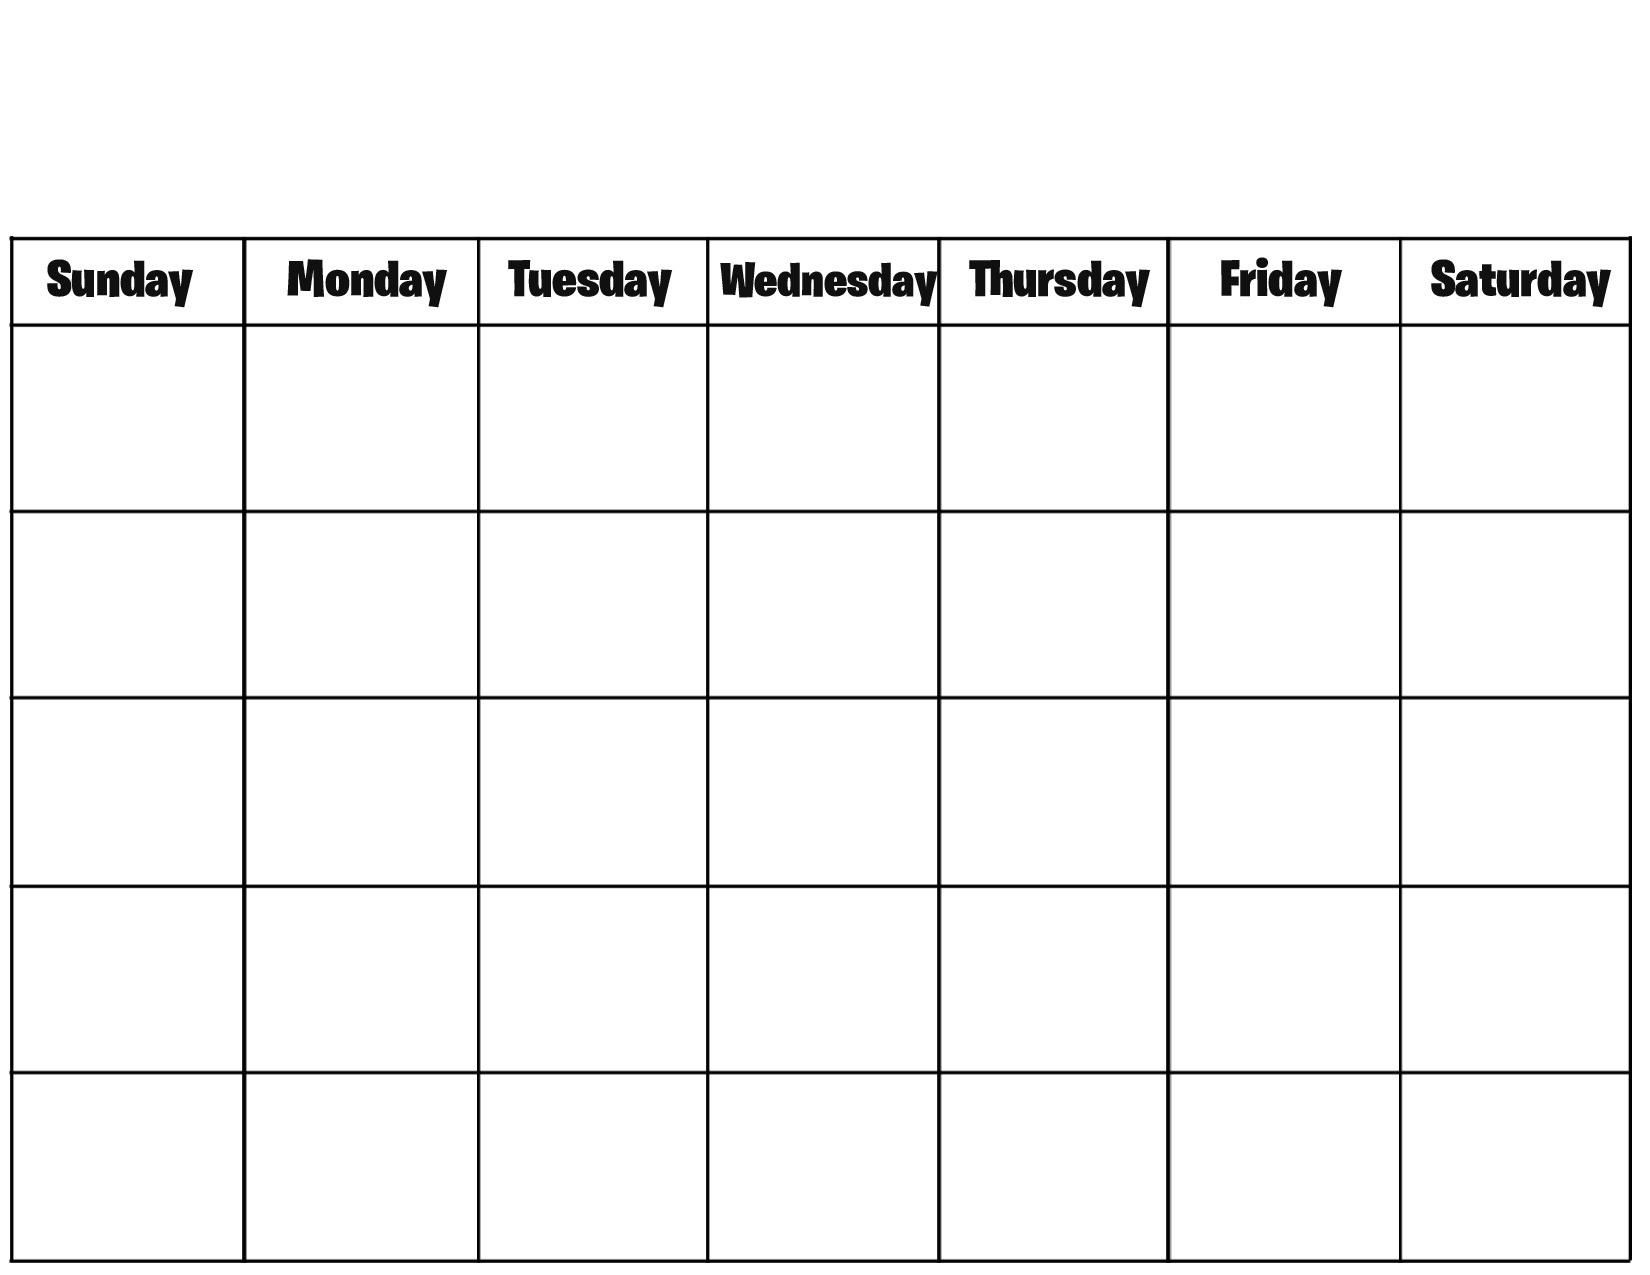 Incredible Calendar Blank For Printing • Printable Blank Calendar_Free Calendar Blanks To Print